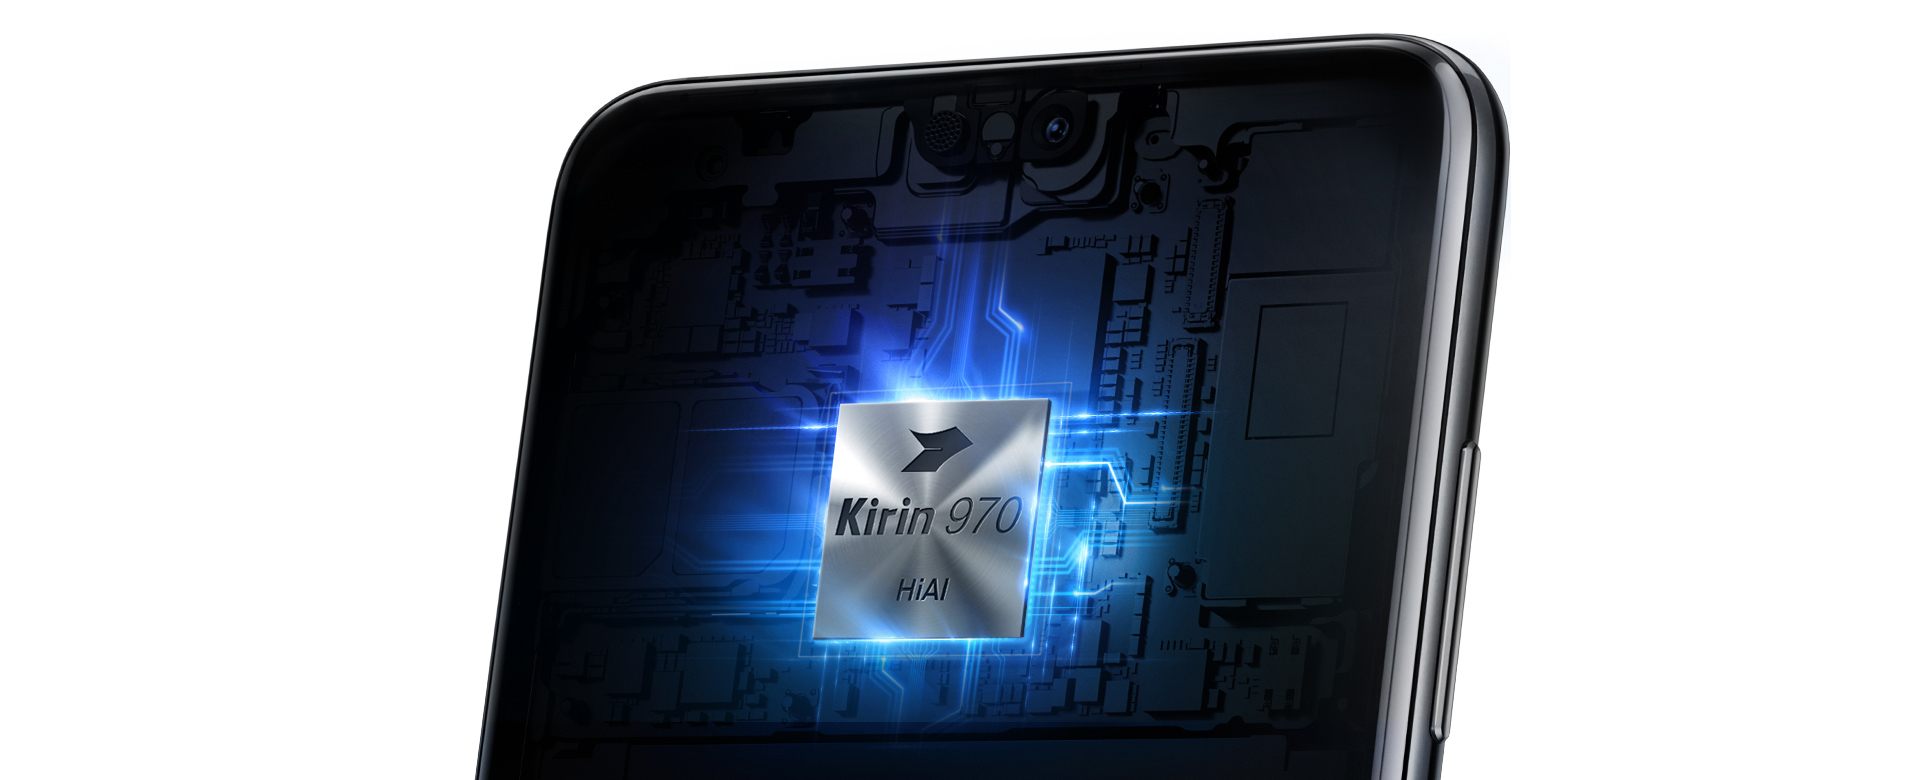 https://consumer-img.huawei.com/content/dam/huawei-cbg-site/common/mkt/pdp/phones/p20-update1/img/performence/huawei-p20-kirin-970-original.jpg